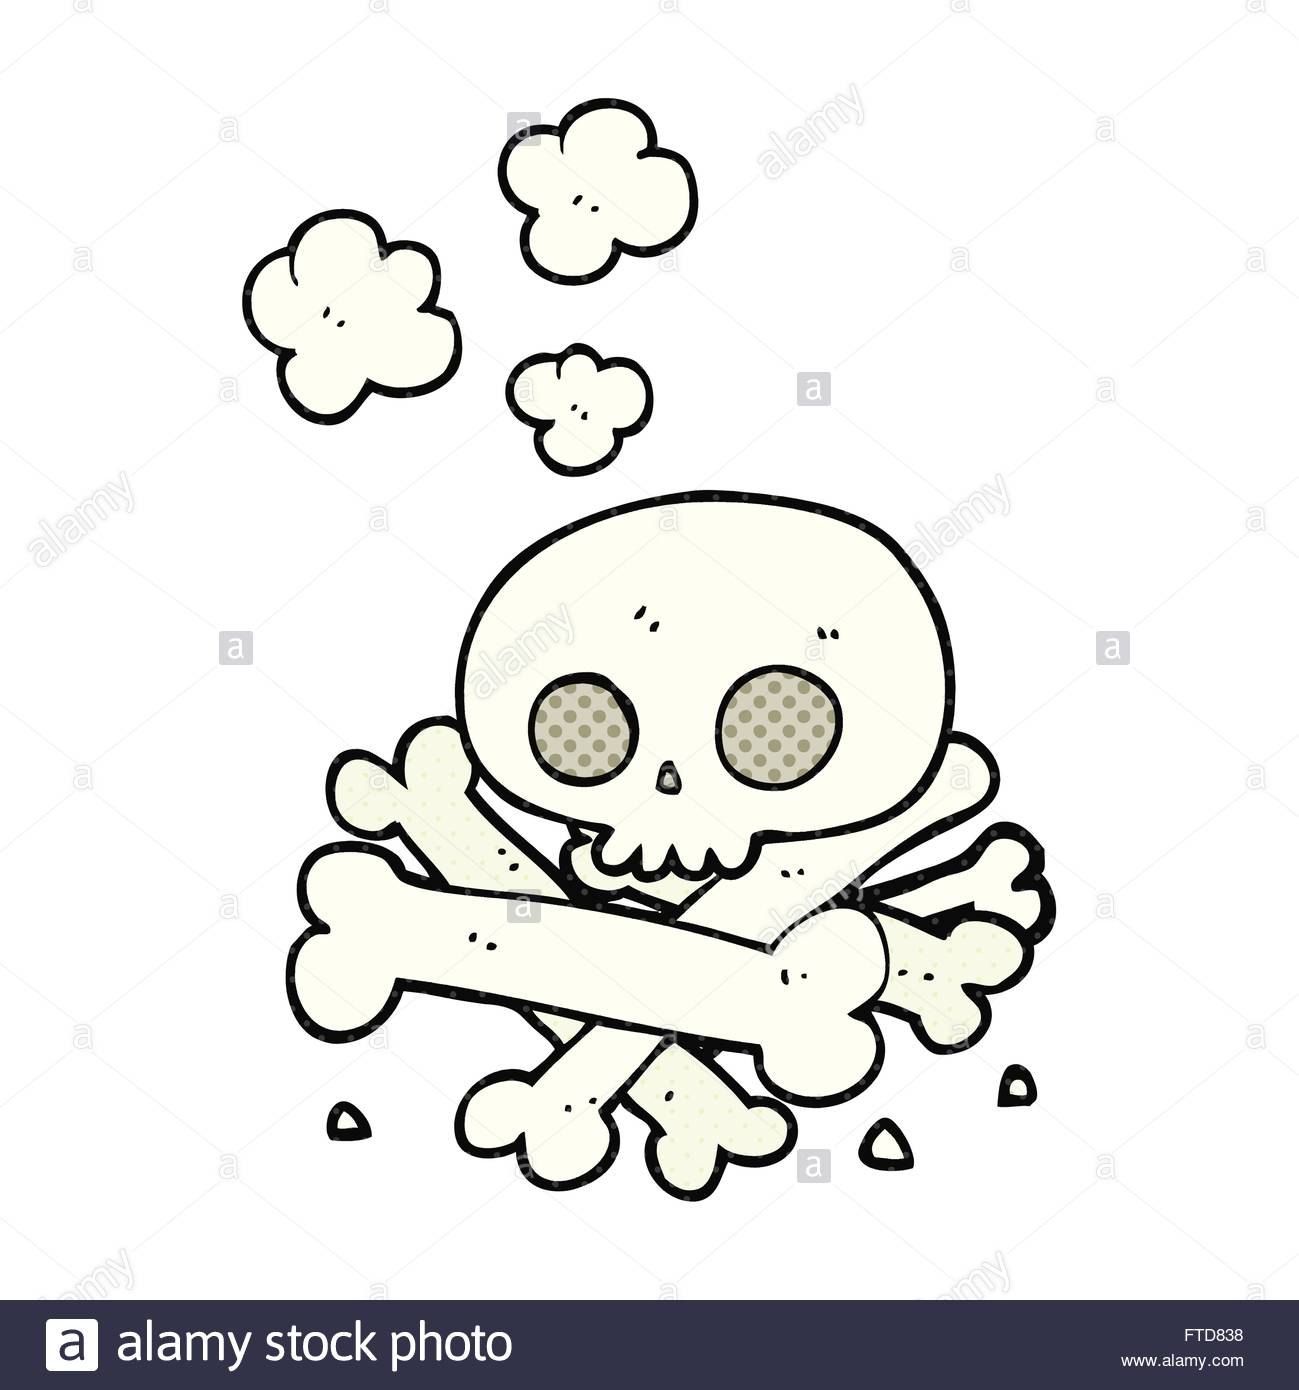 1299x1390 Freehand Drawn Cartoon Pile Of Bones Stock Vector Art